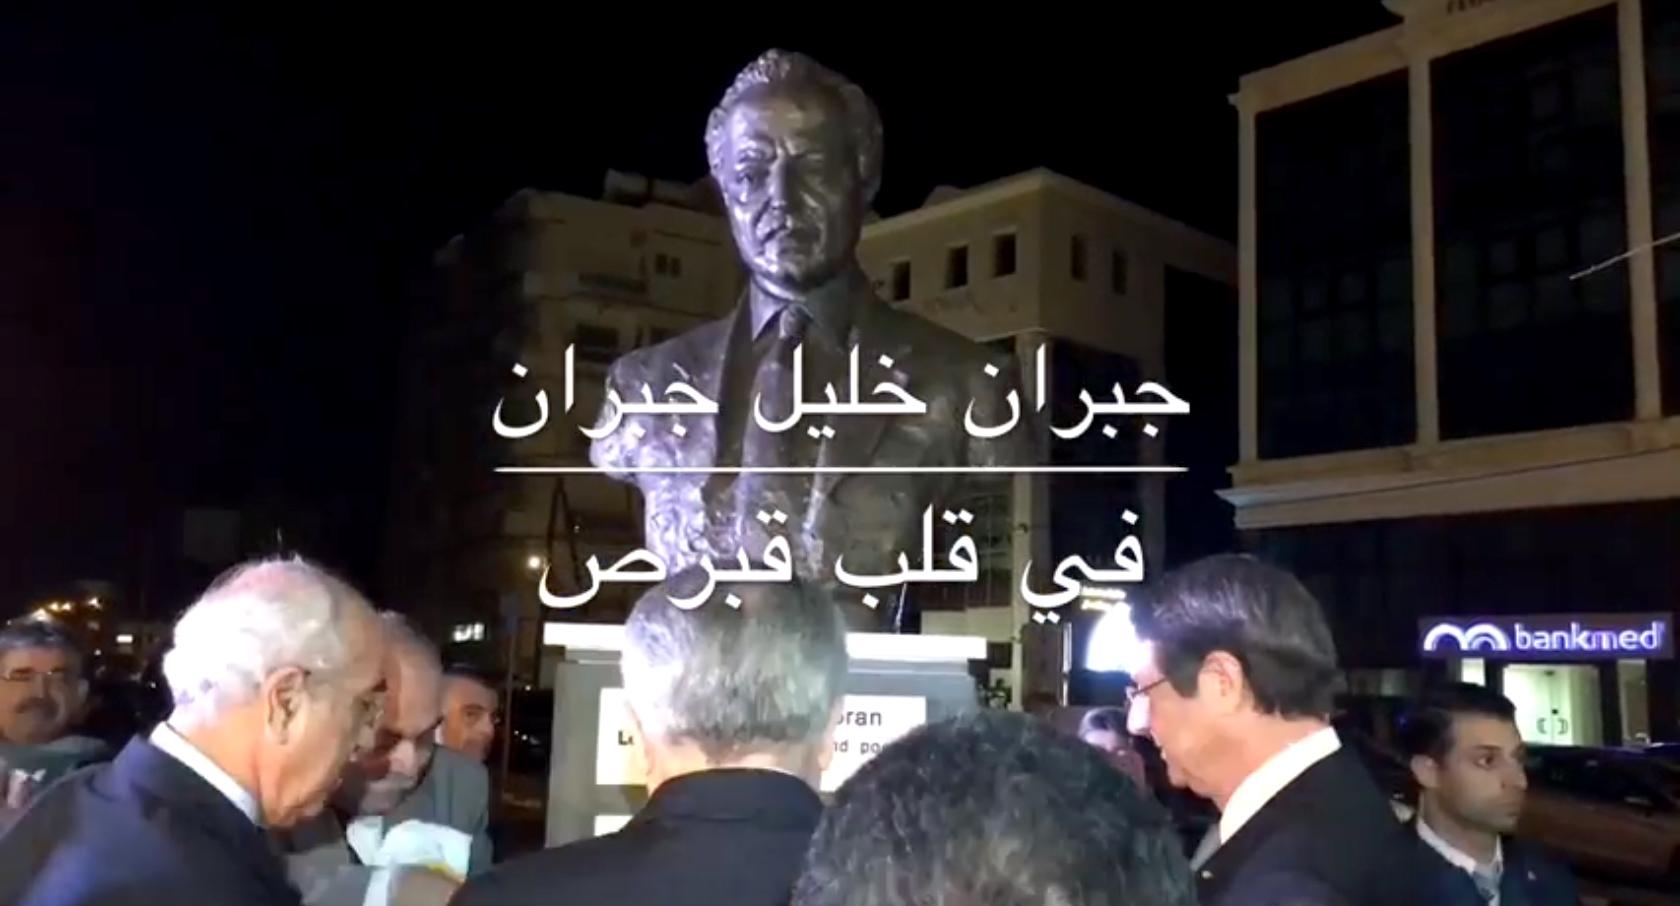 جبران خليل جبران في قلب قبرص